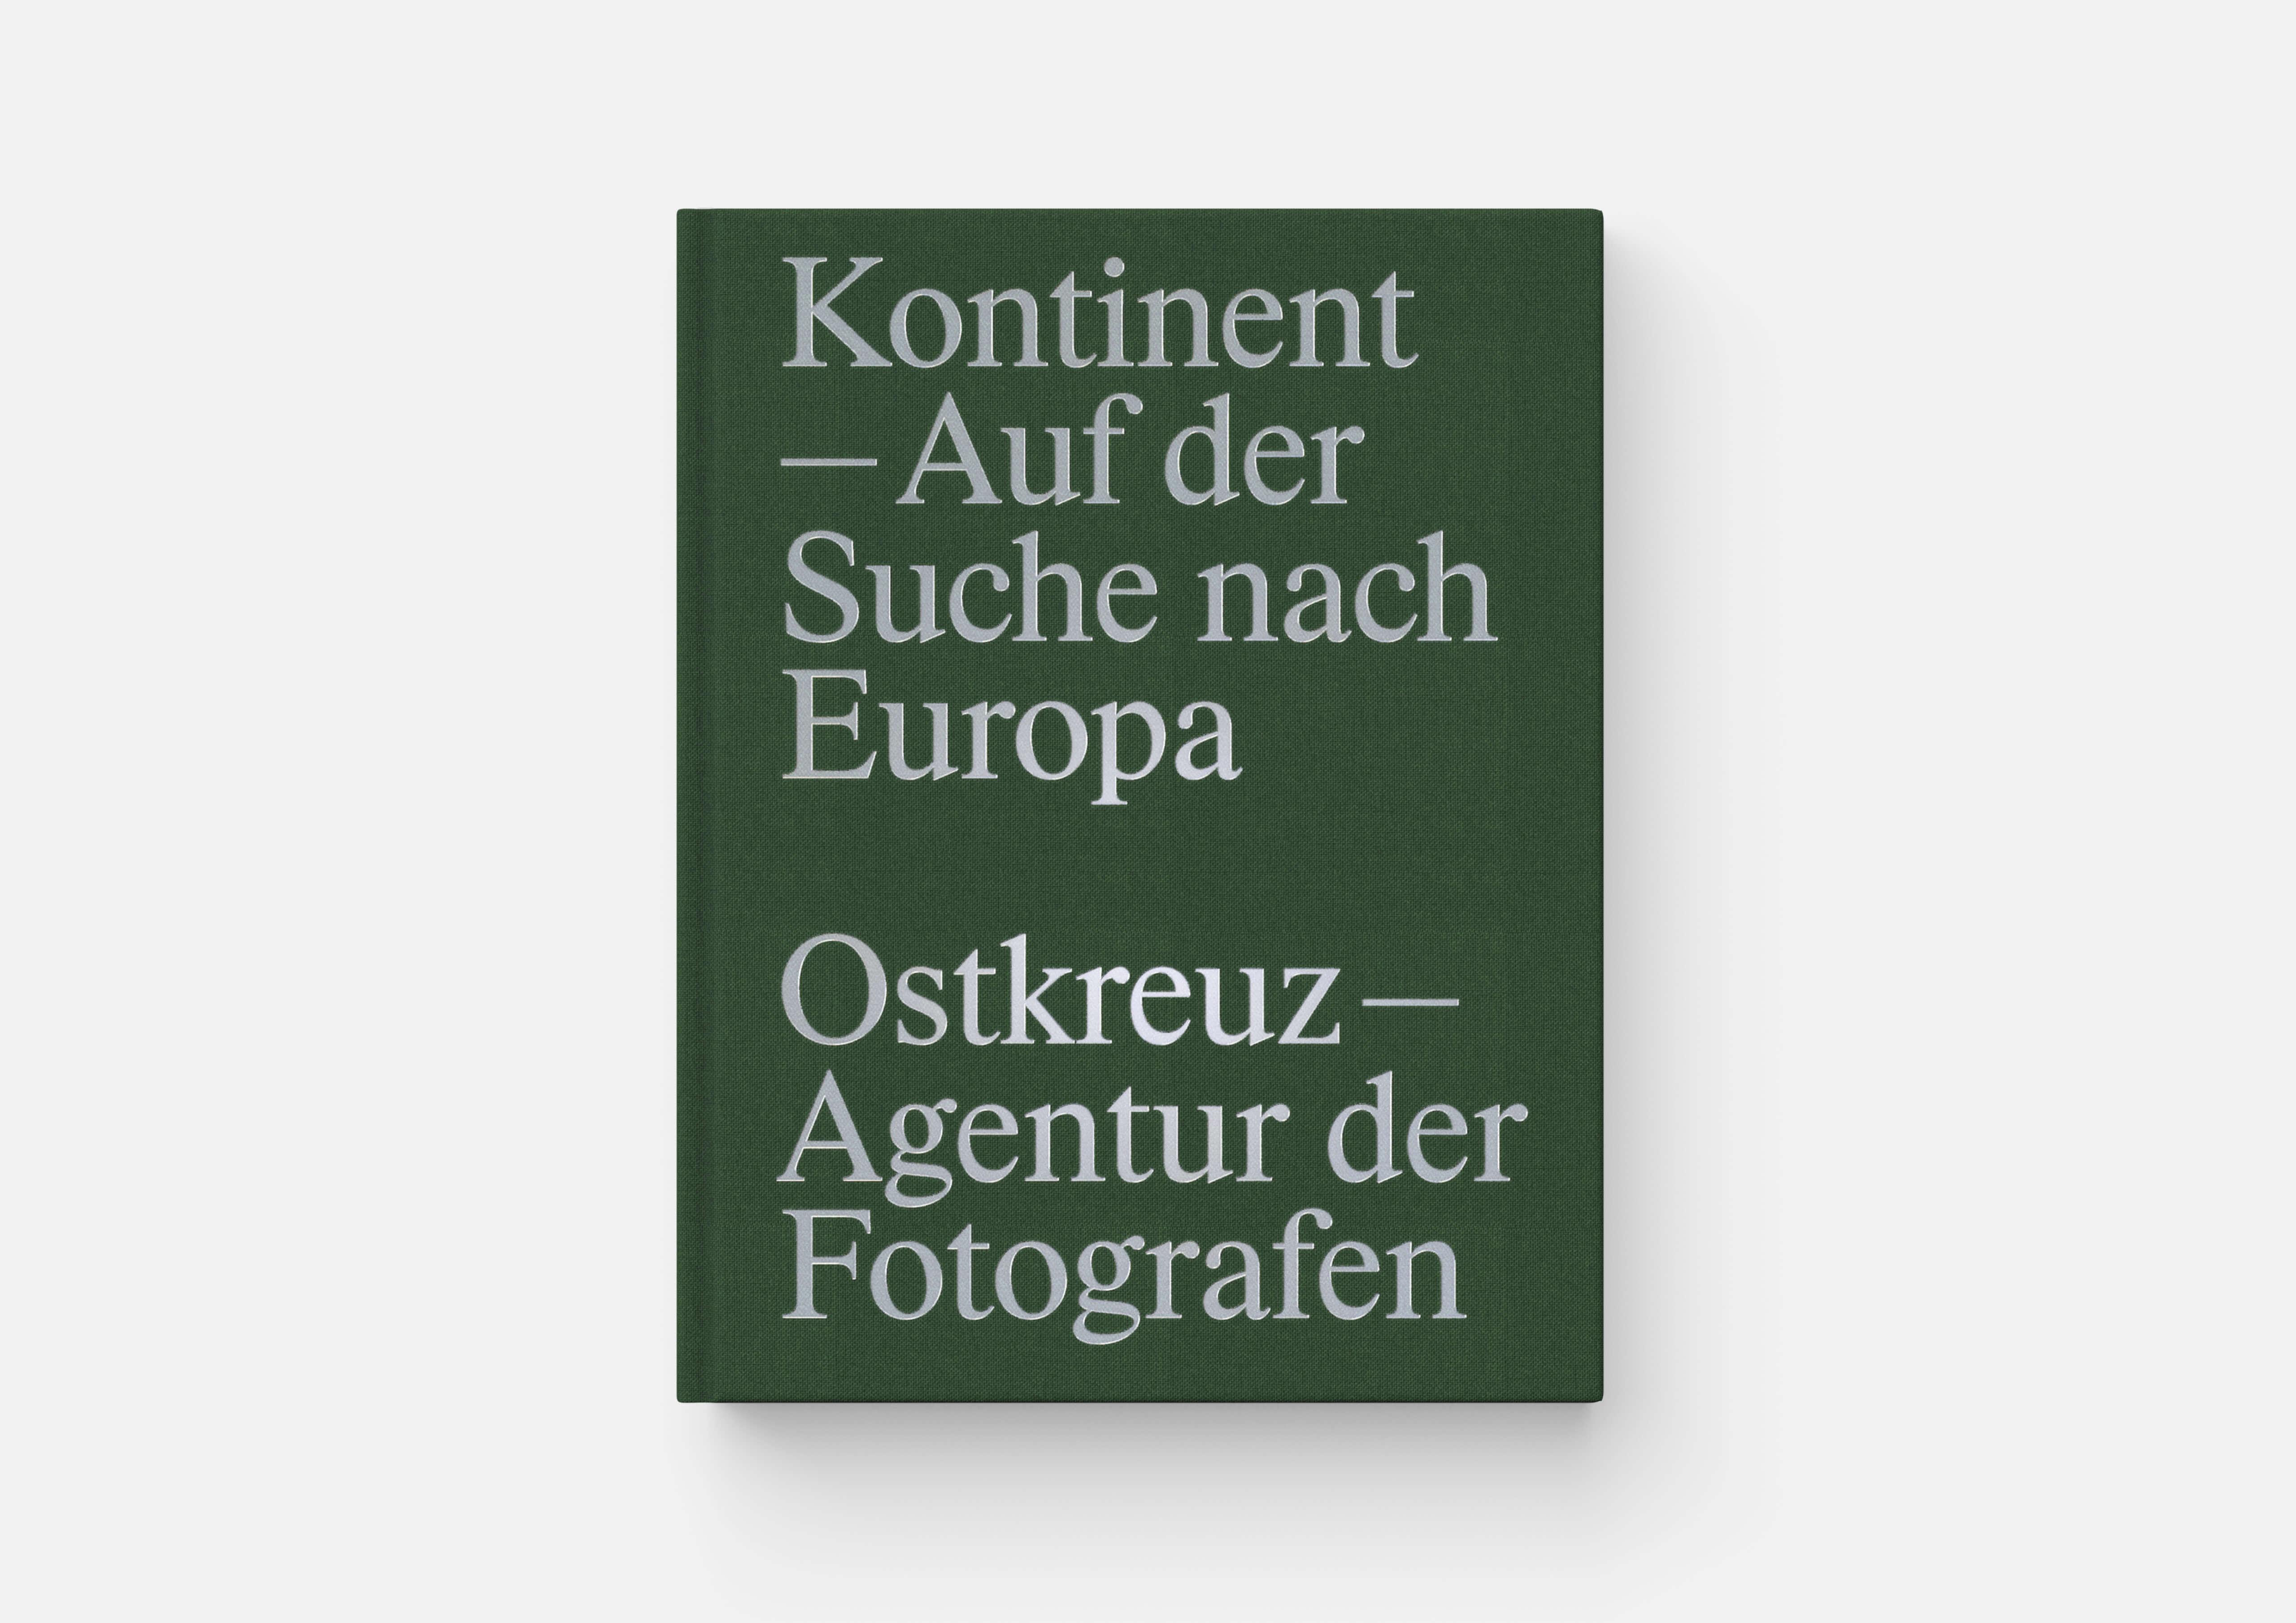 https://neuegestaltung.de/media/pages/clients/ostkreuz-kontinent/50c8f494e8-1606670610/1_ostkreuz-kont-cover-front.jpg